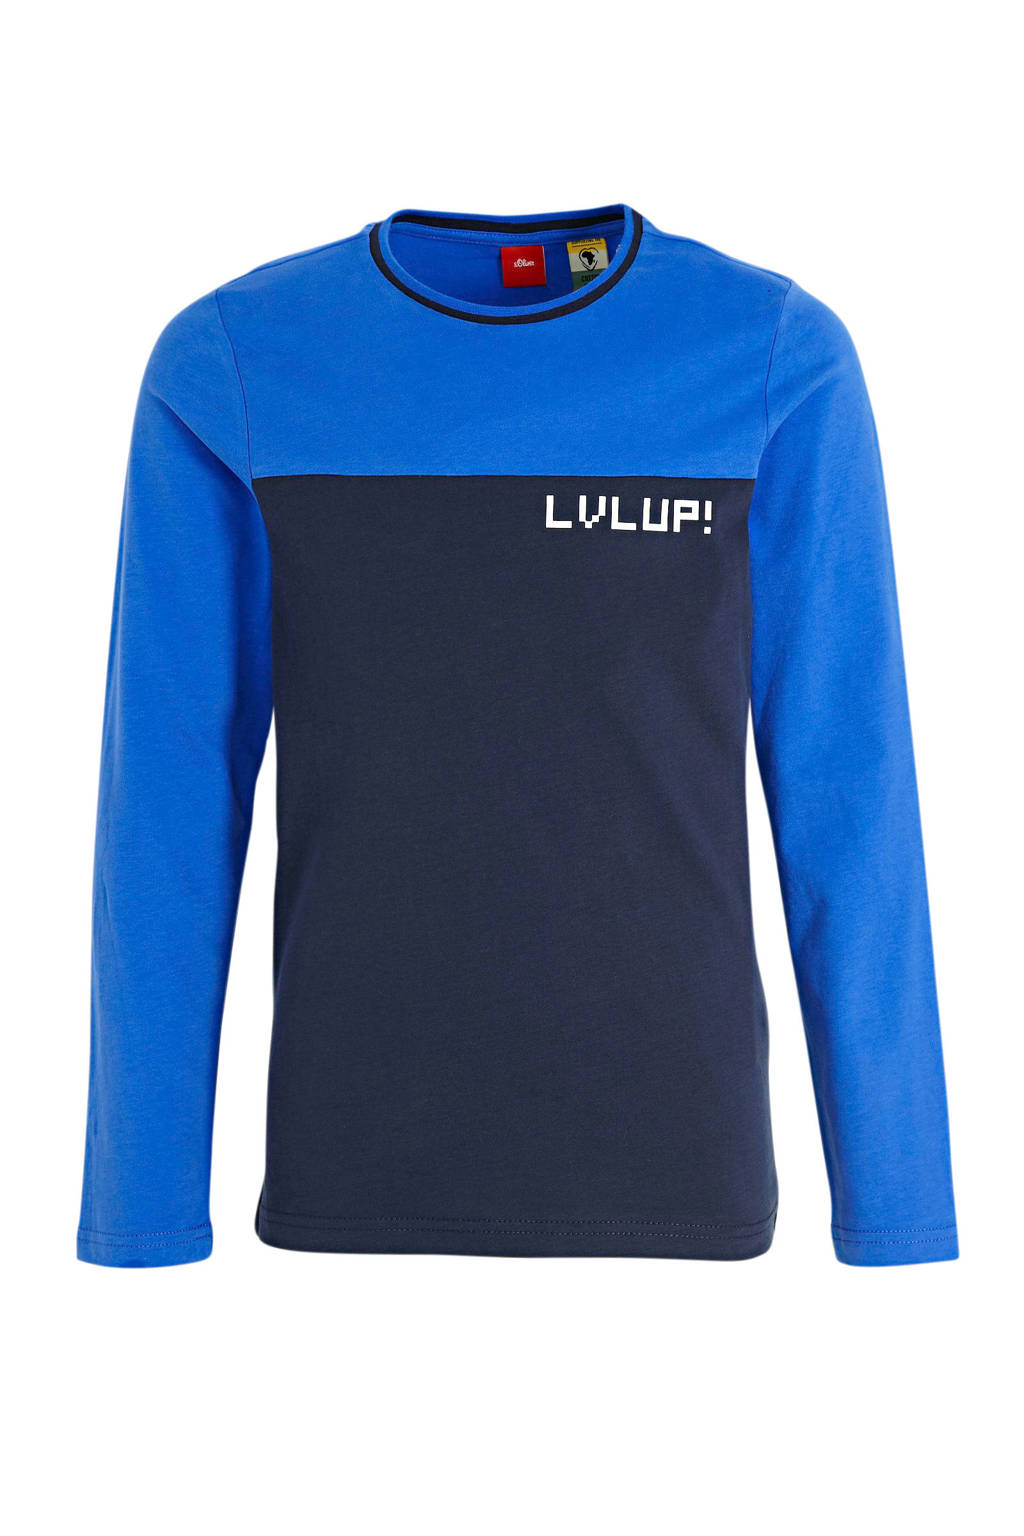 s.Oliver T-shirt donkerblauw/blauw/wit, Donkerblauw/blauw/wit